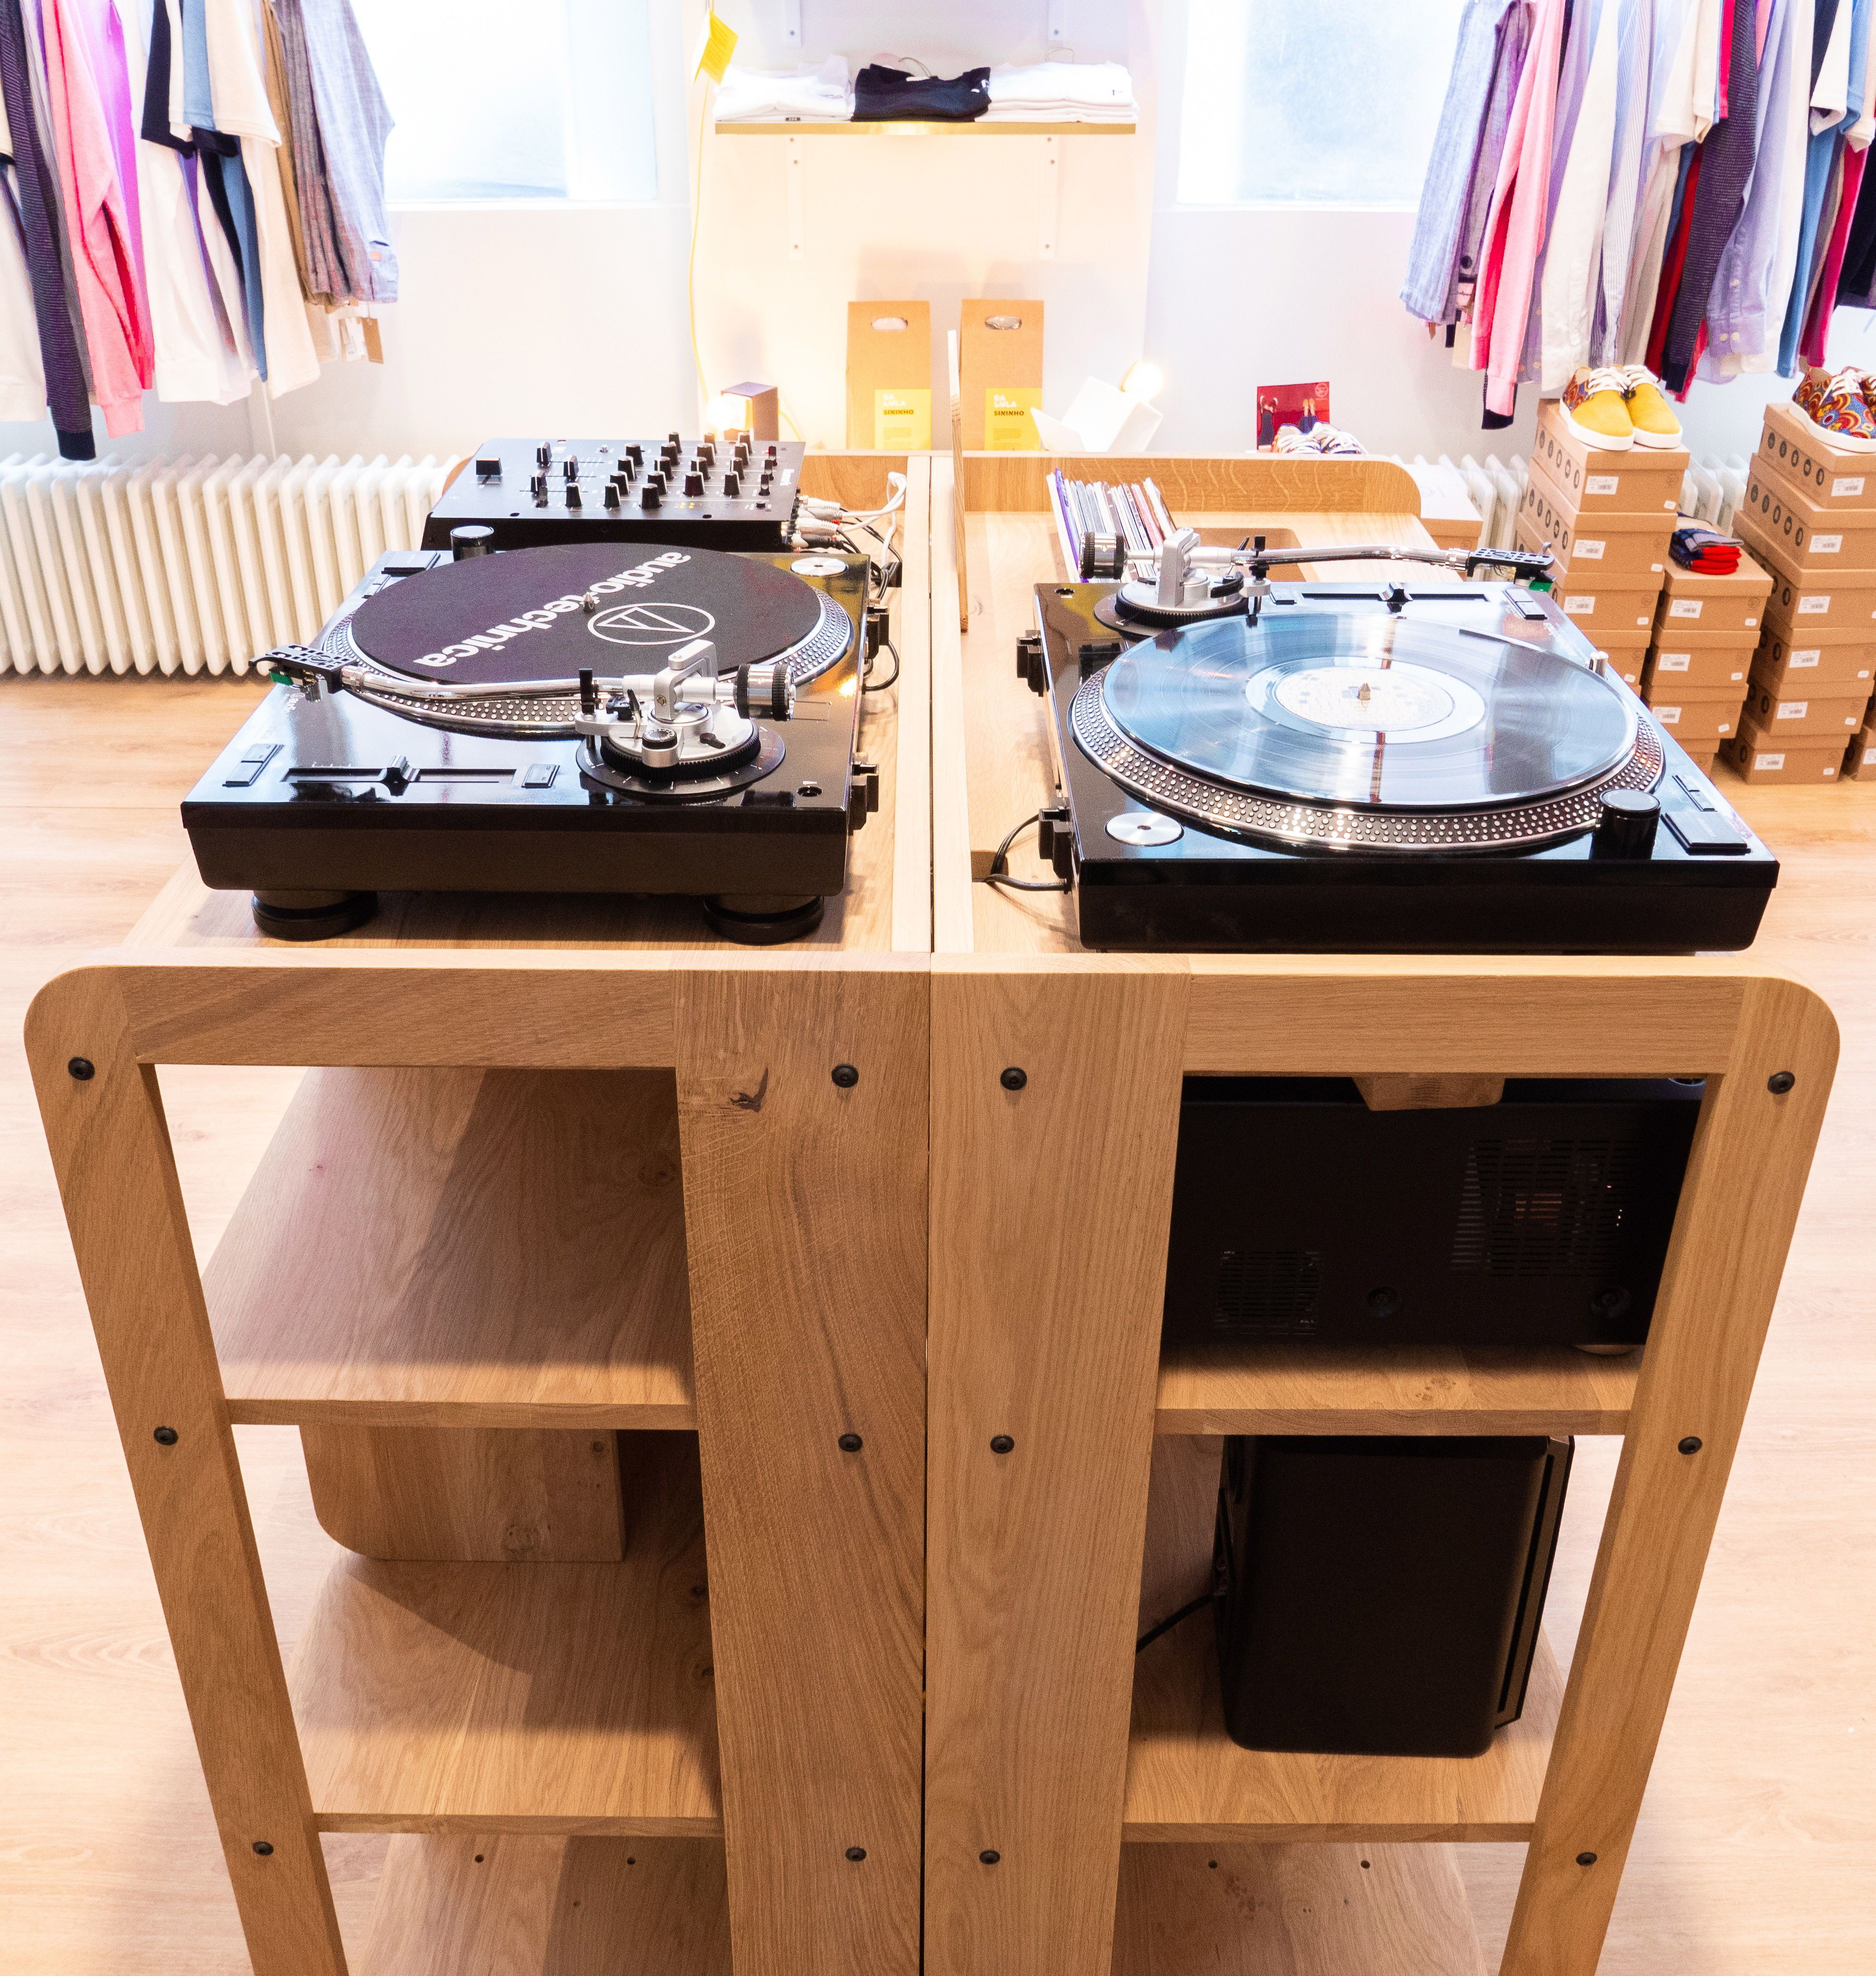 Meuble Vinyle Portee Design Et Adaptable Made In France Meuble Vinyle Vinyle Meuble